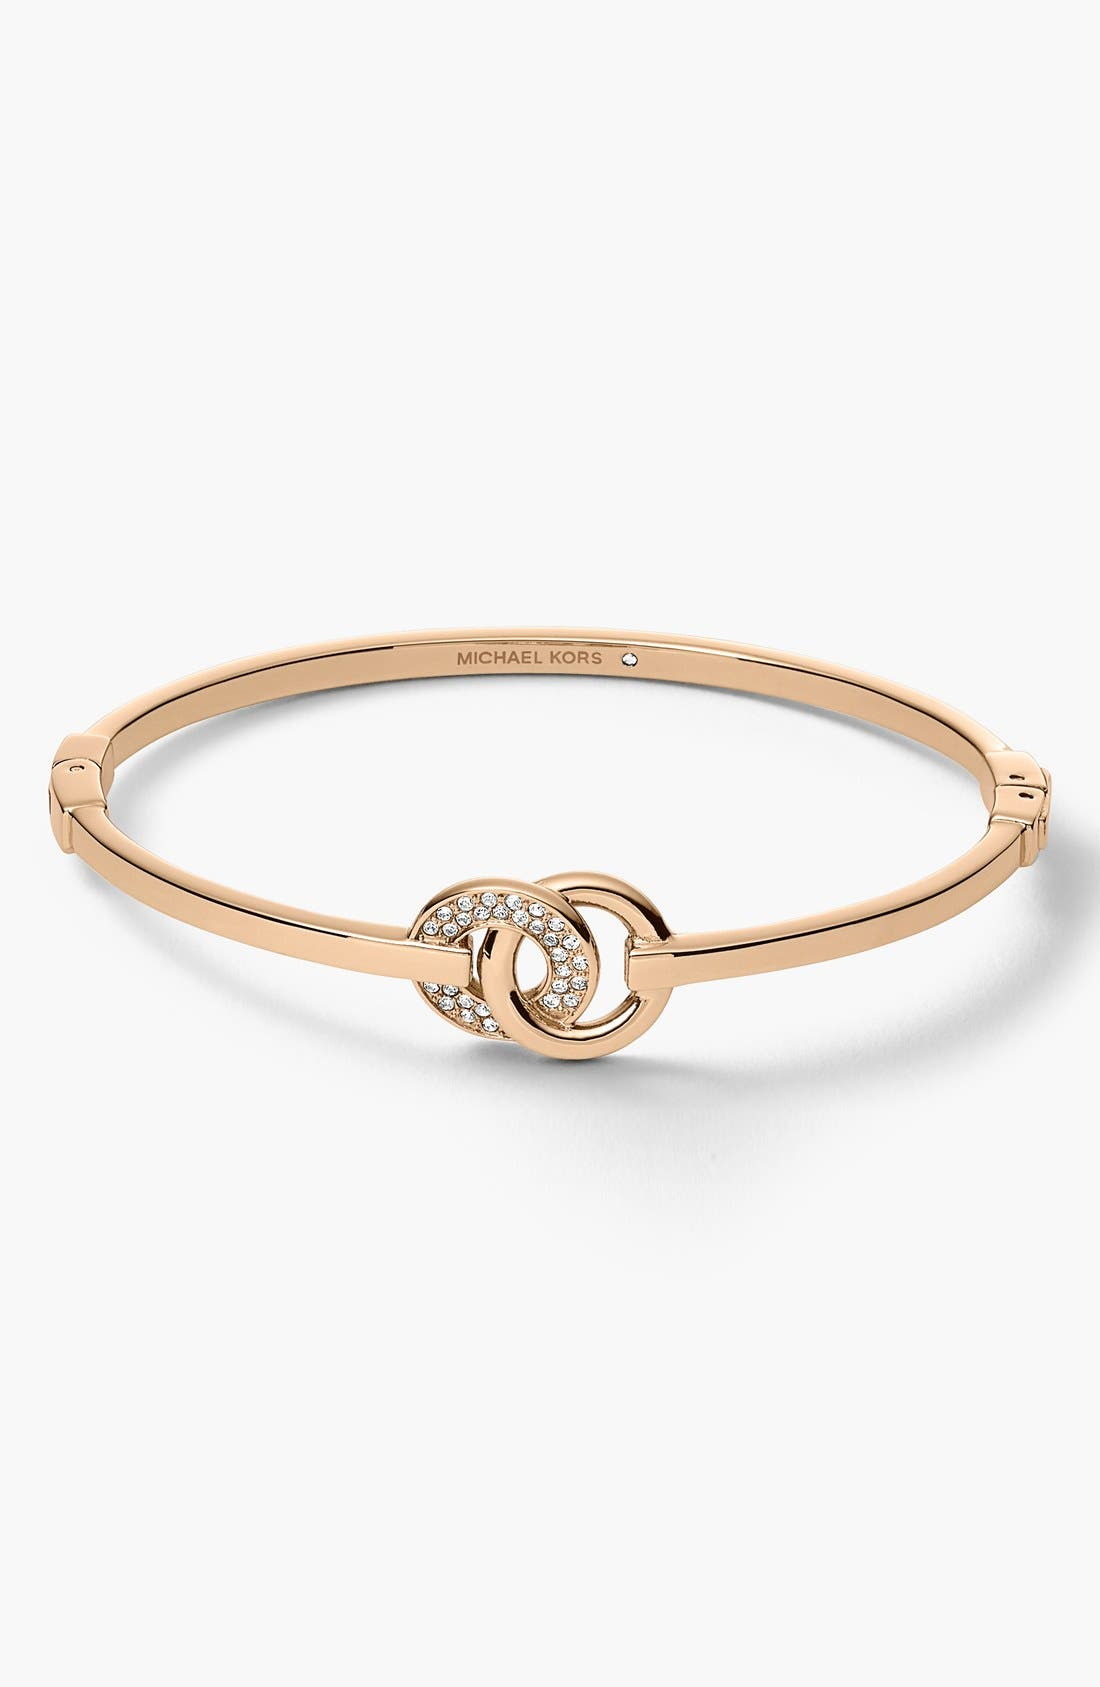 Main Image - Michael Kors 'Statement Brilliance' Double Ring Hinge Bangle